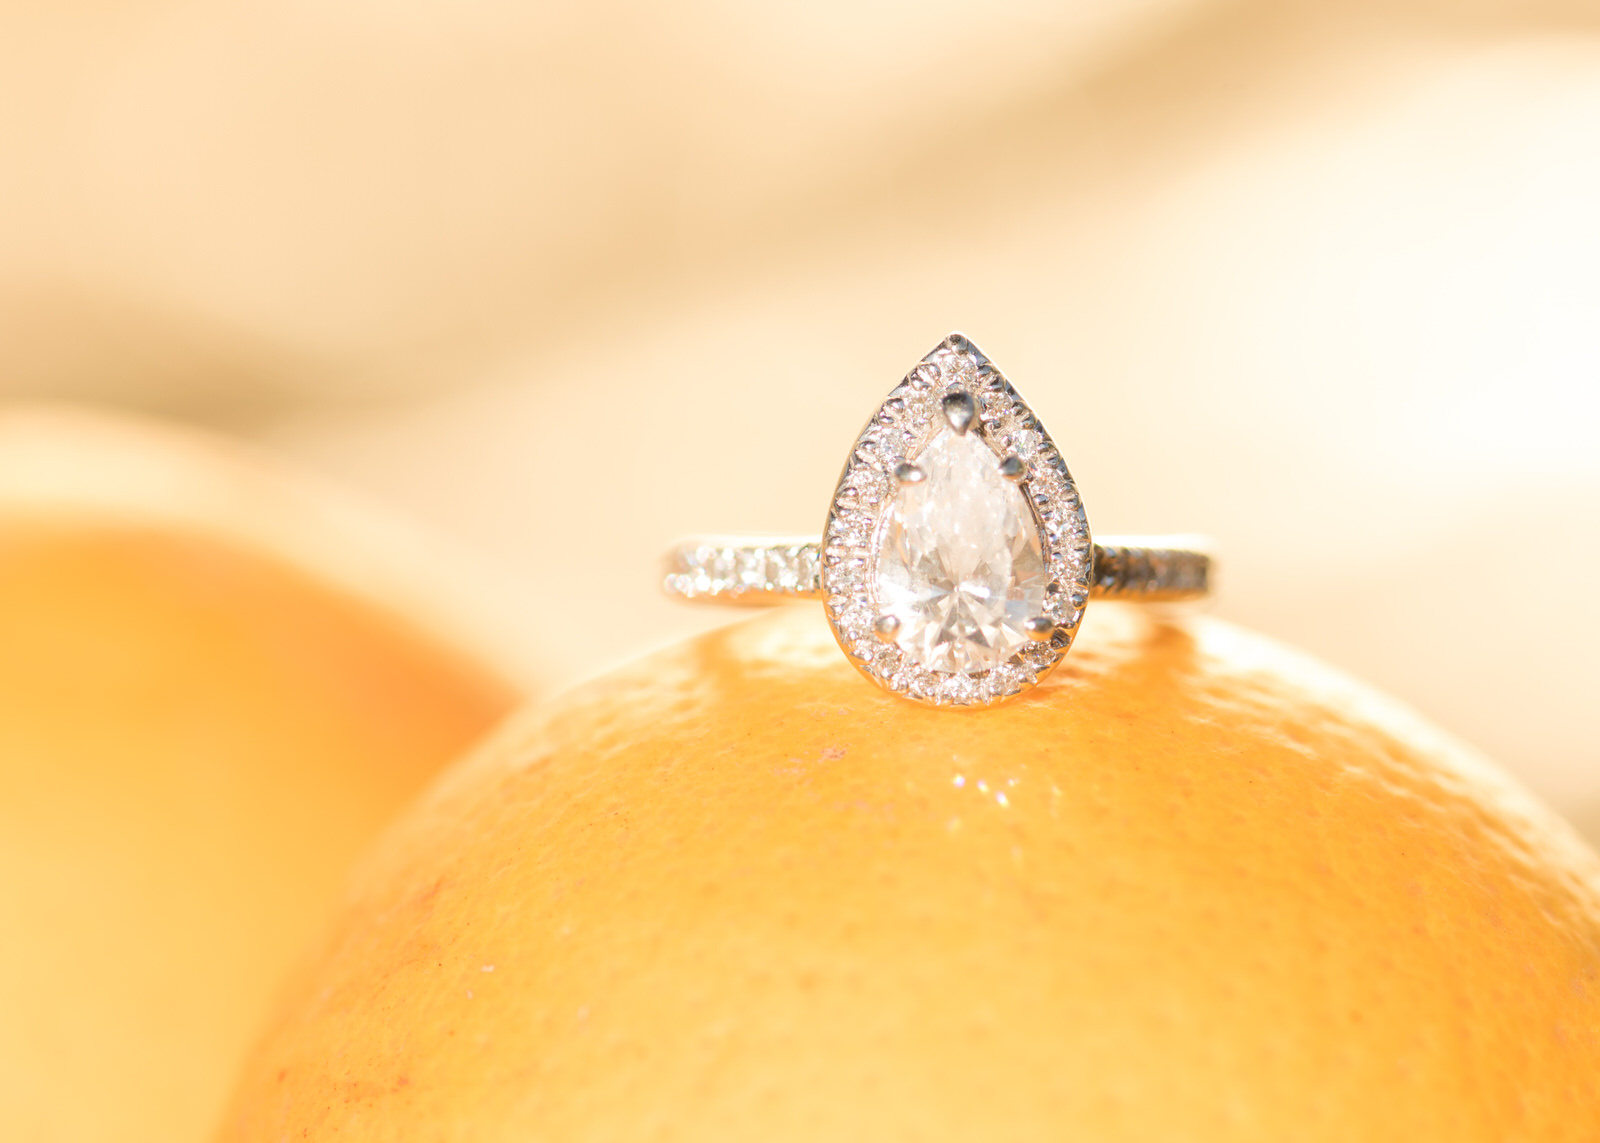 Pear Shaped Diamond Engagement Ring Goldfarb Bellevue.jpg